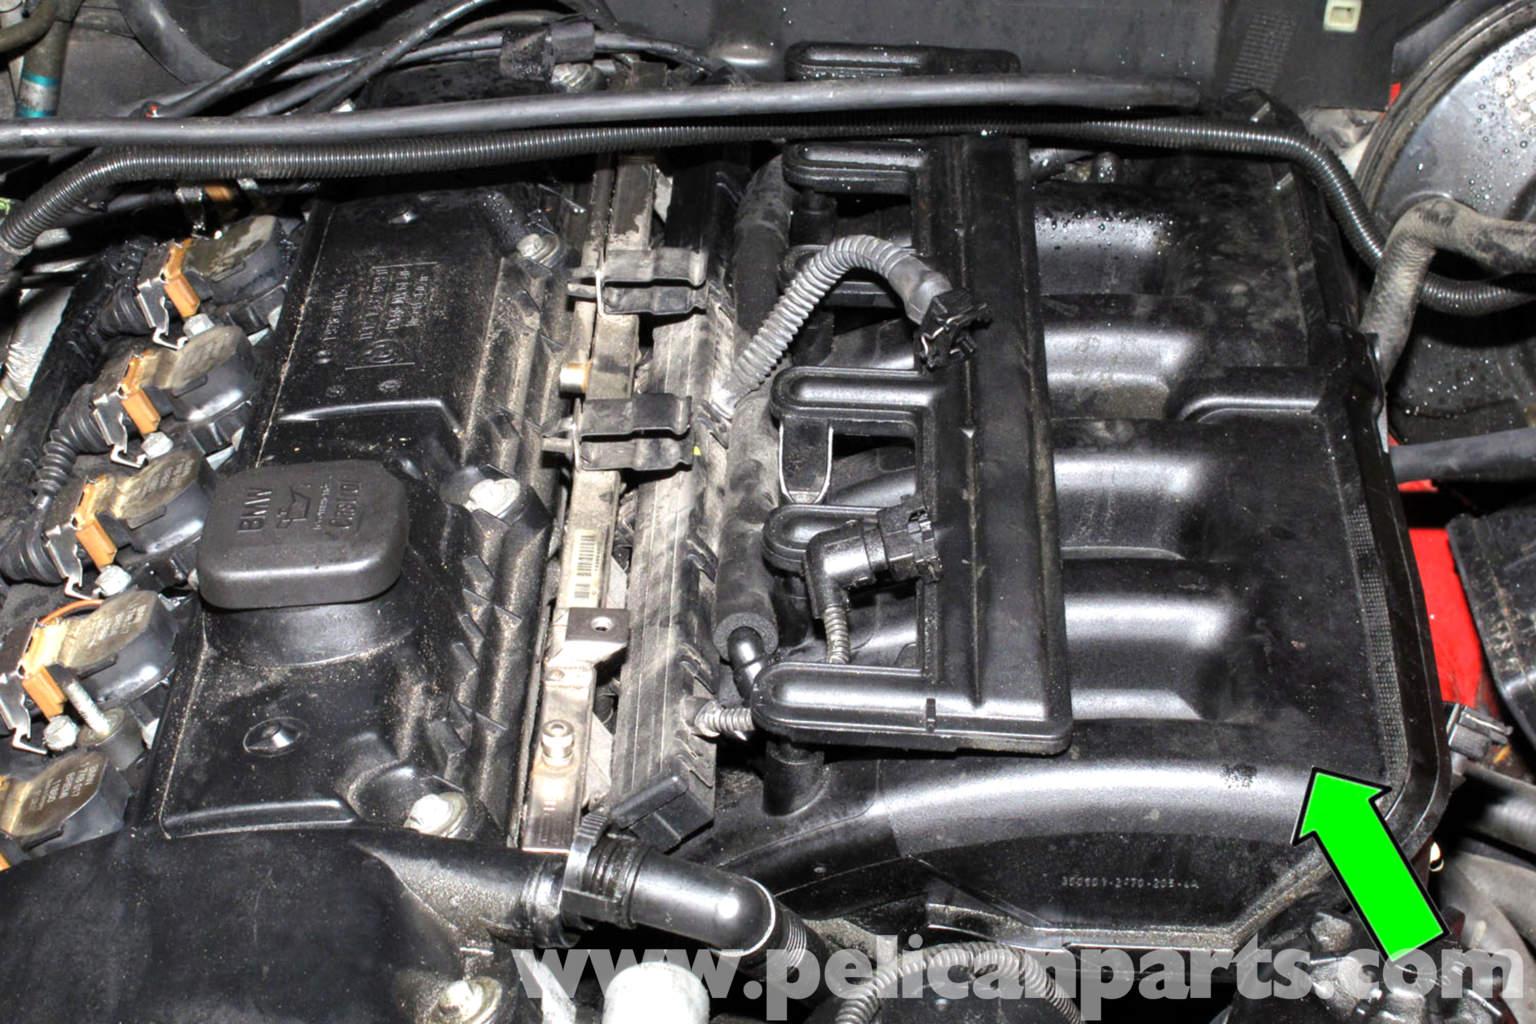 Bmw Z3 Engine Management Systems 1996 2002 Pelican Parts Diy Maintenance Article